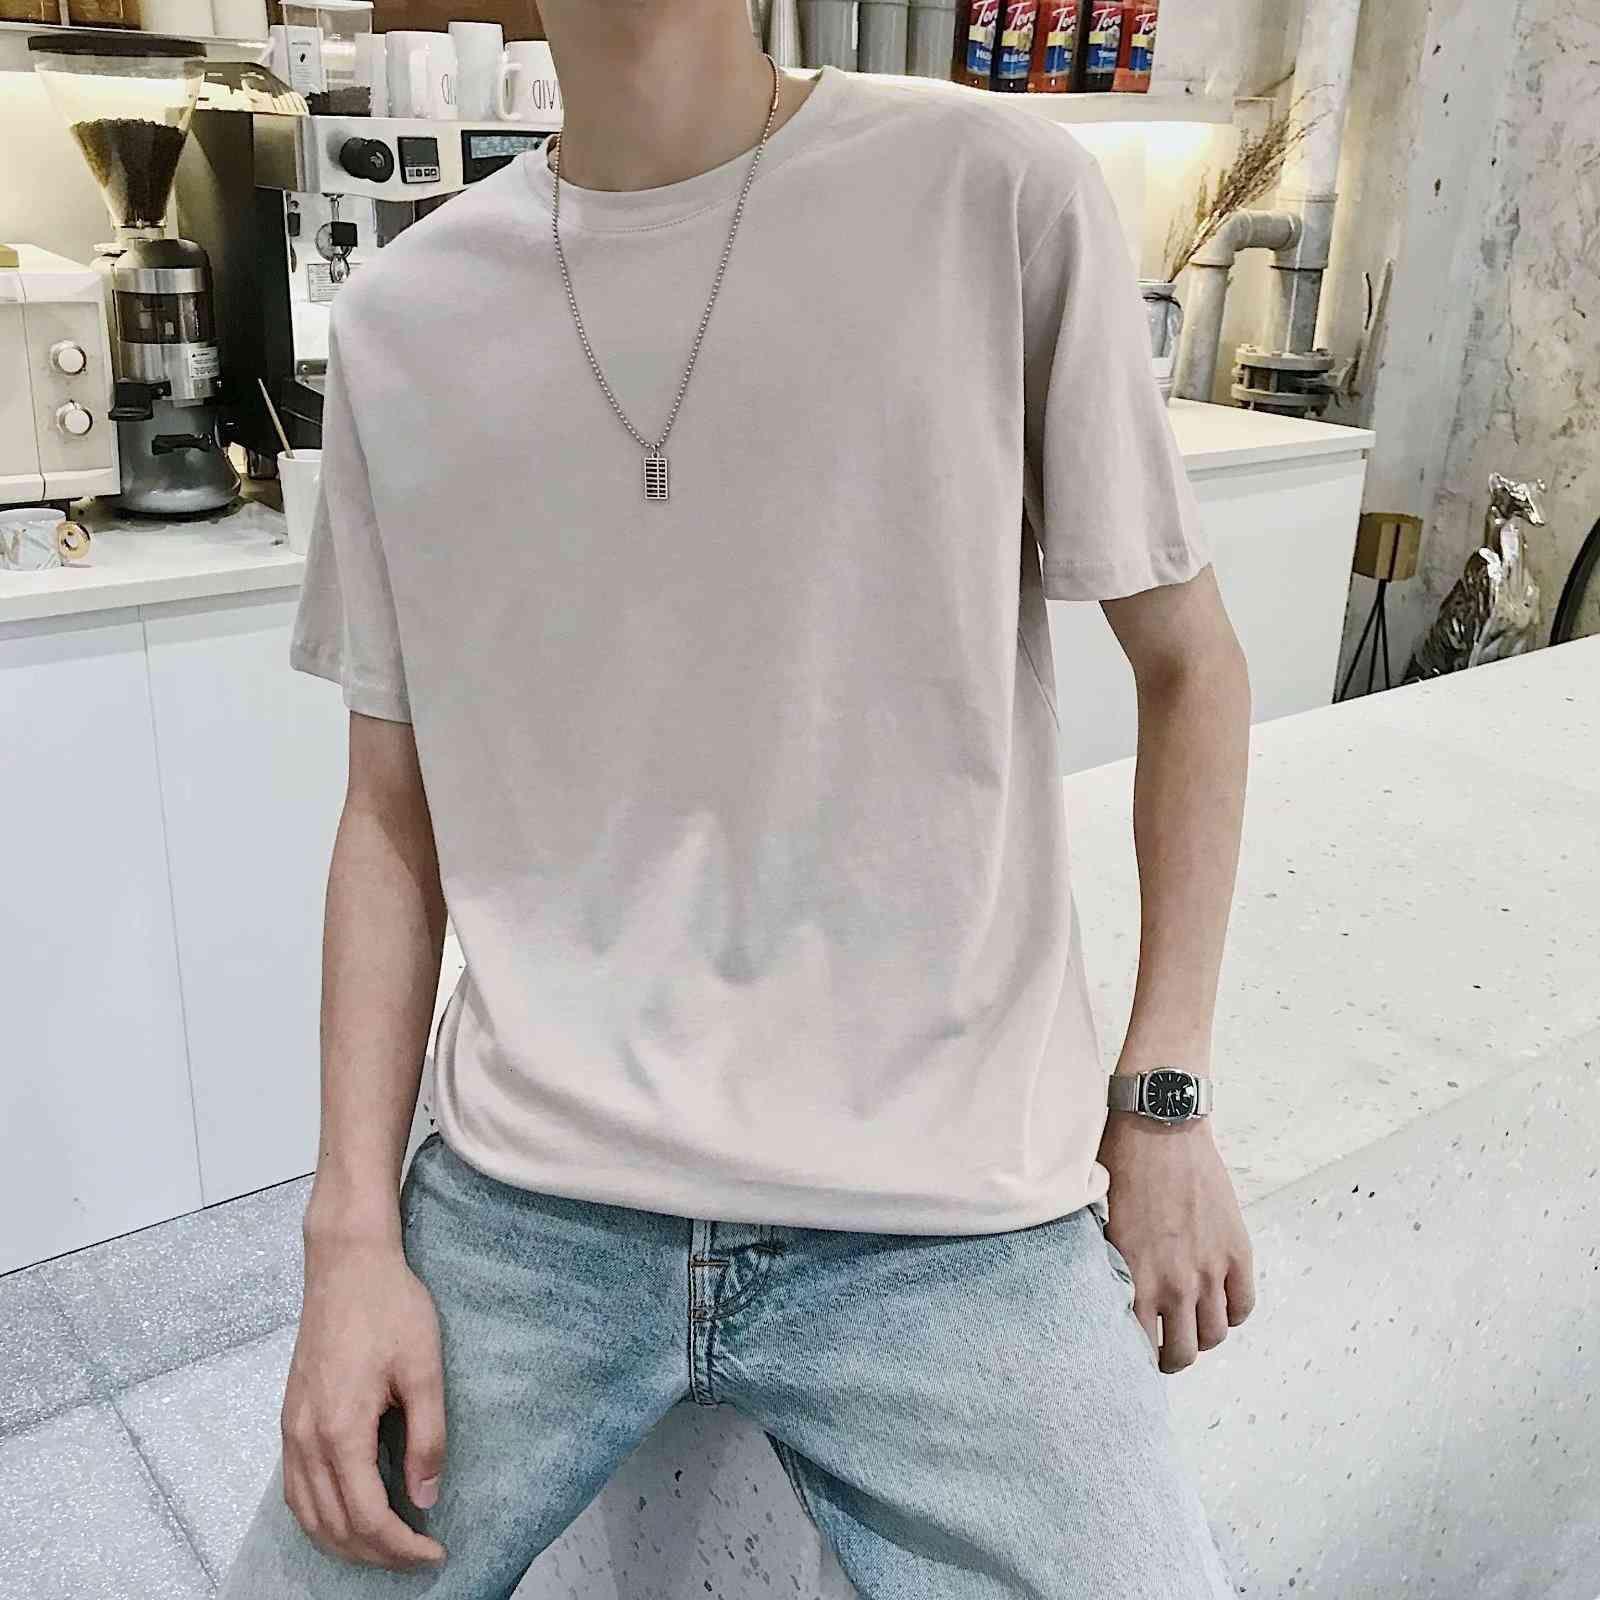 Sommer Kurze Rundhalsausschnitt Zufällige Halbhülse Bodenhemd Jugend Mode Marke Top Herren T-Shirt